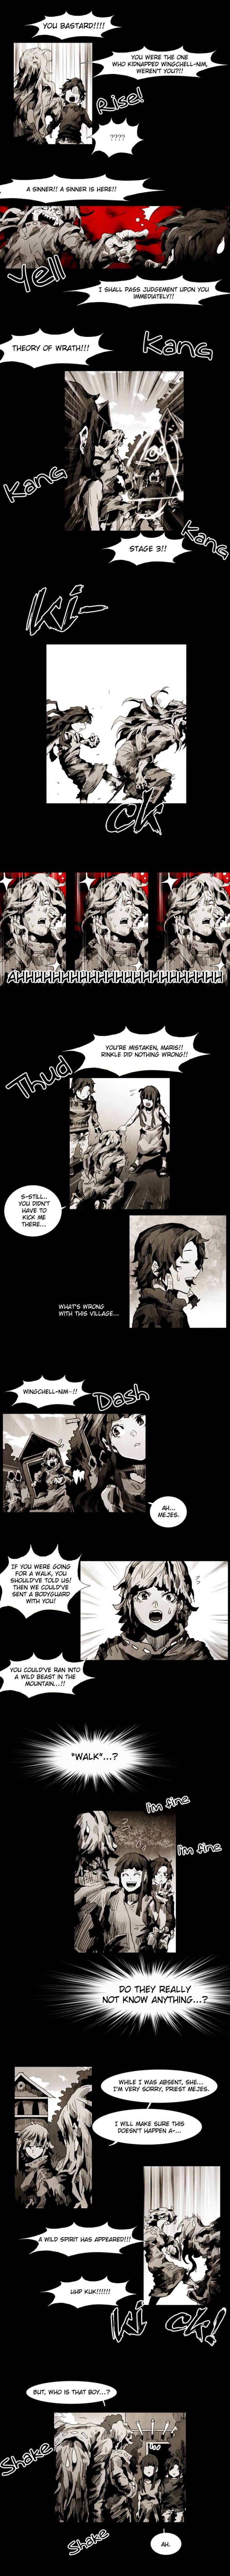 Black Behemoth 15 Page 2